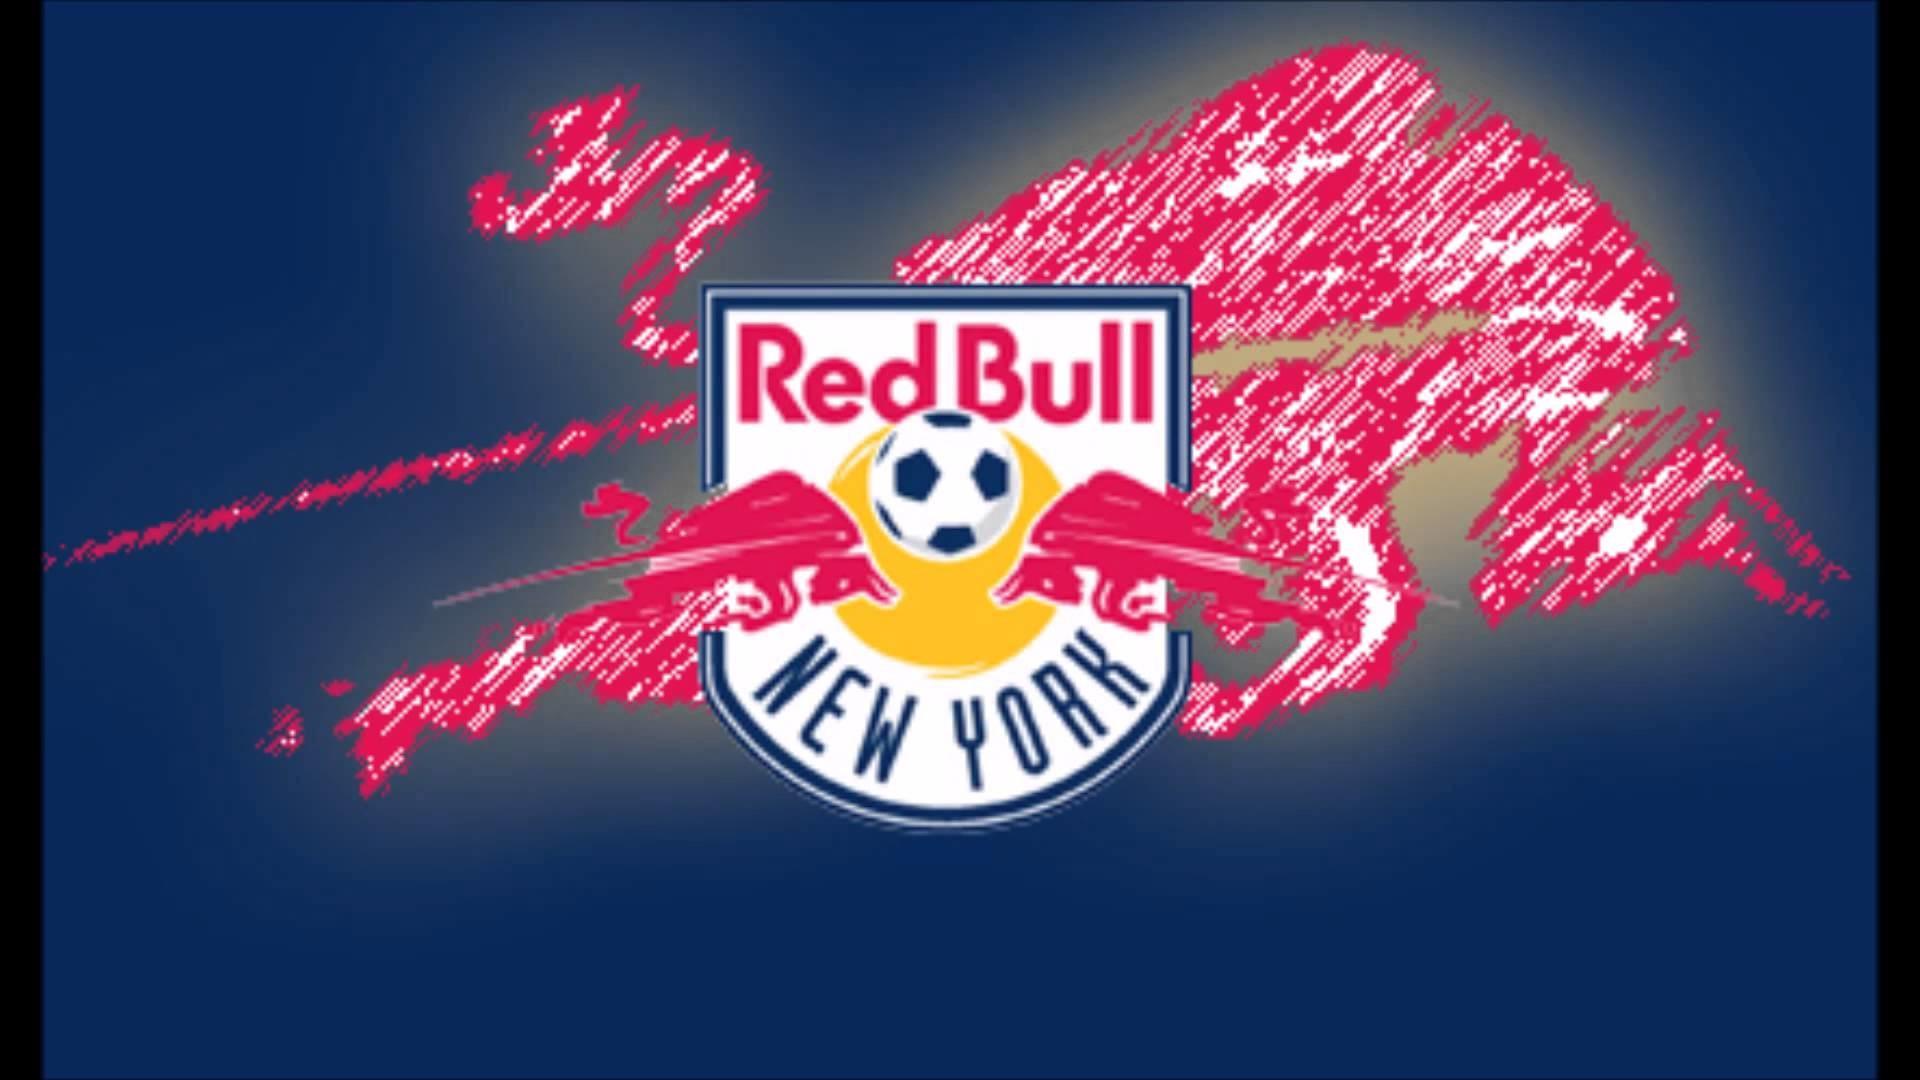 New York Red Bulls Wallpapers (67 Wallpapers)